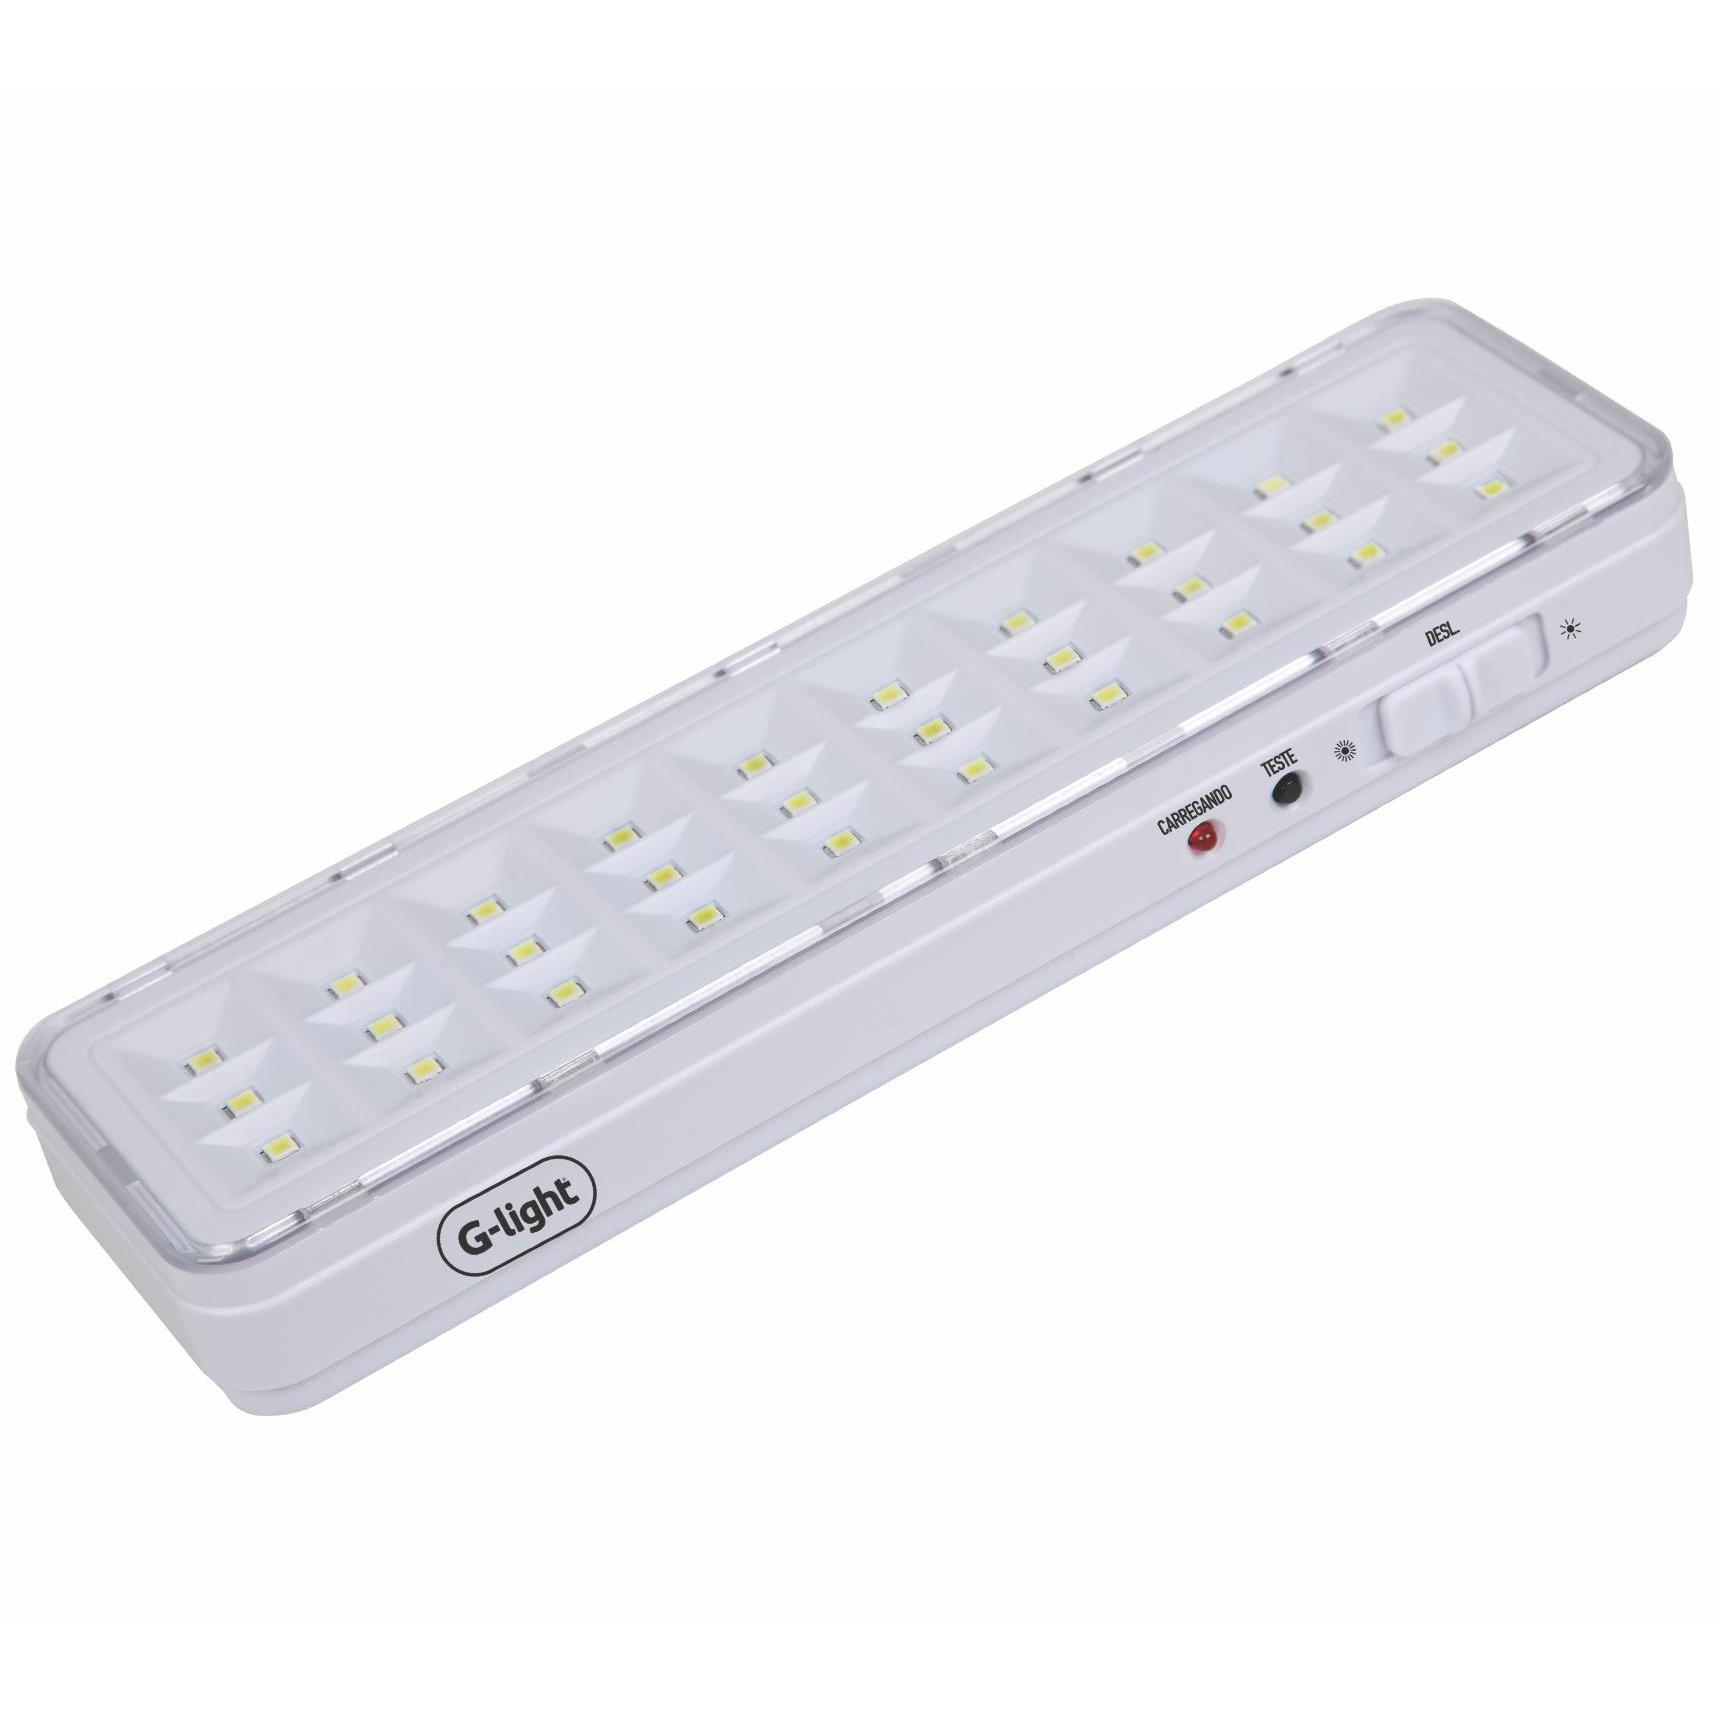 Luminaria de Emergencia 30 LEDs 12W Autovolt - Branco - Glight